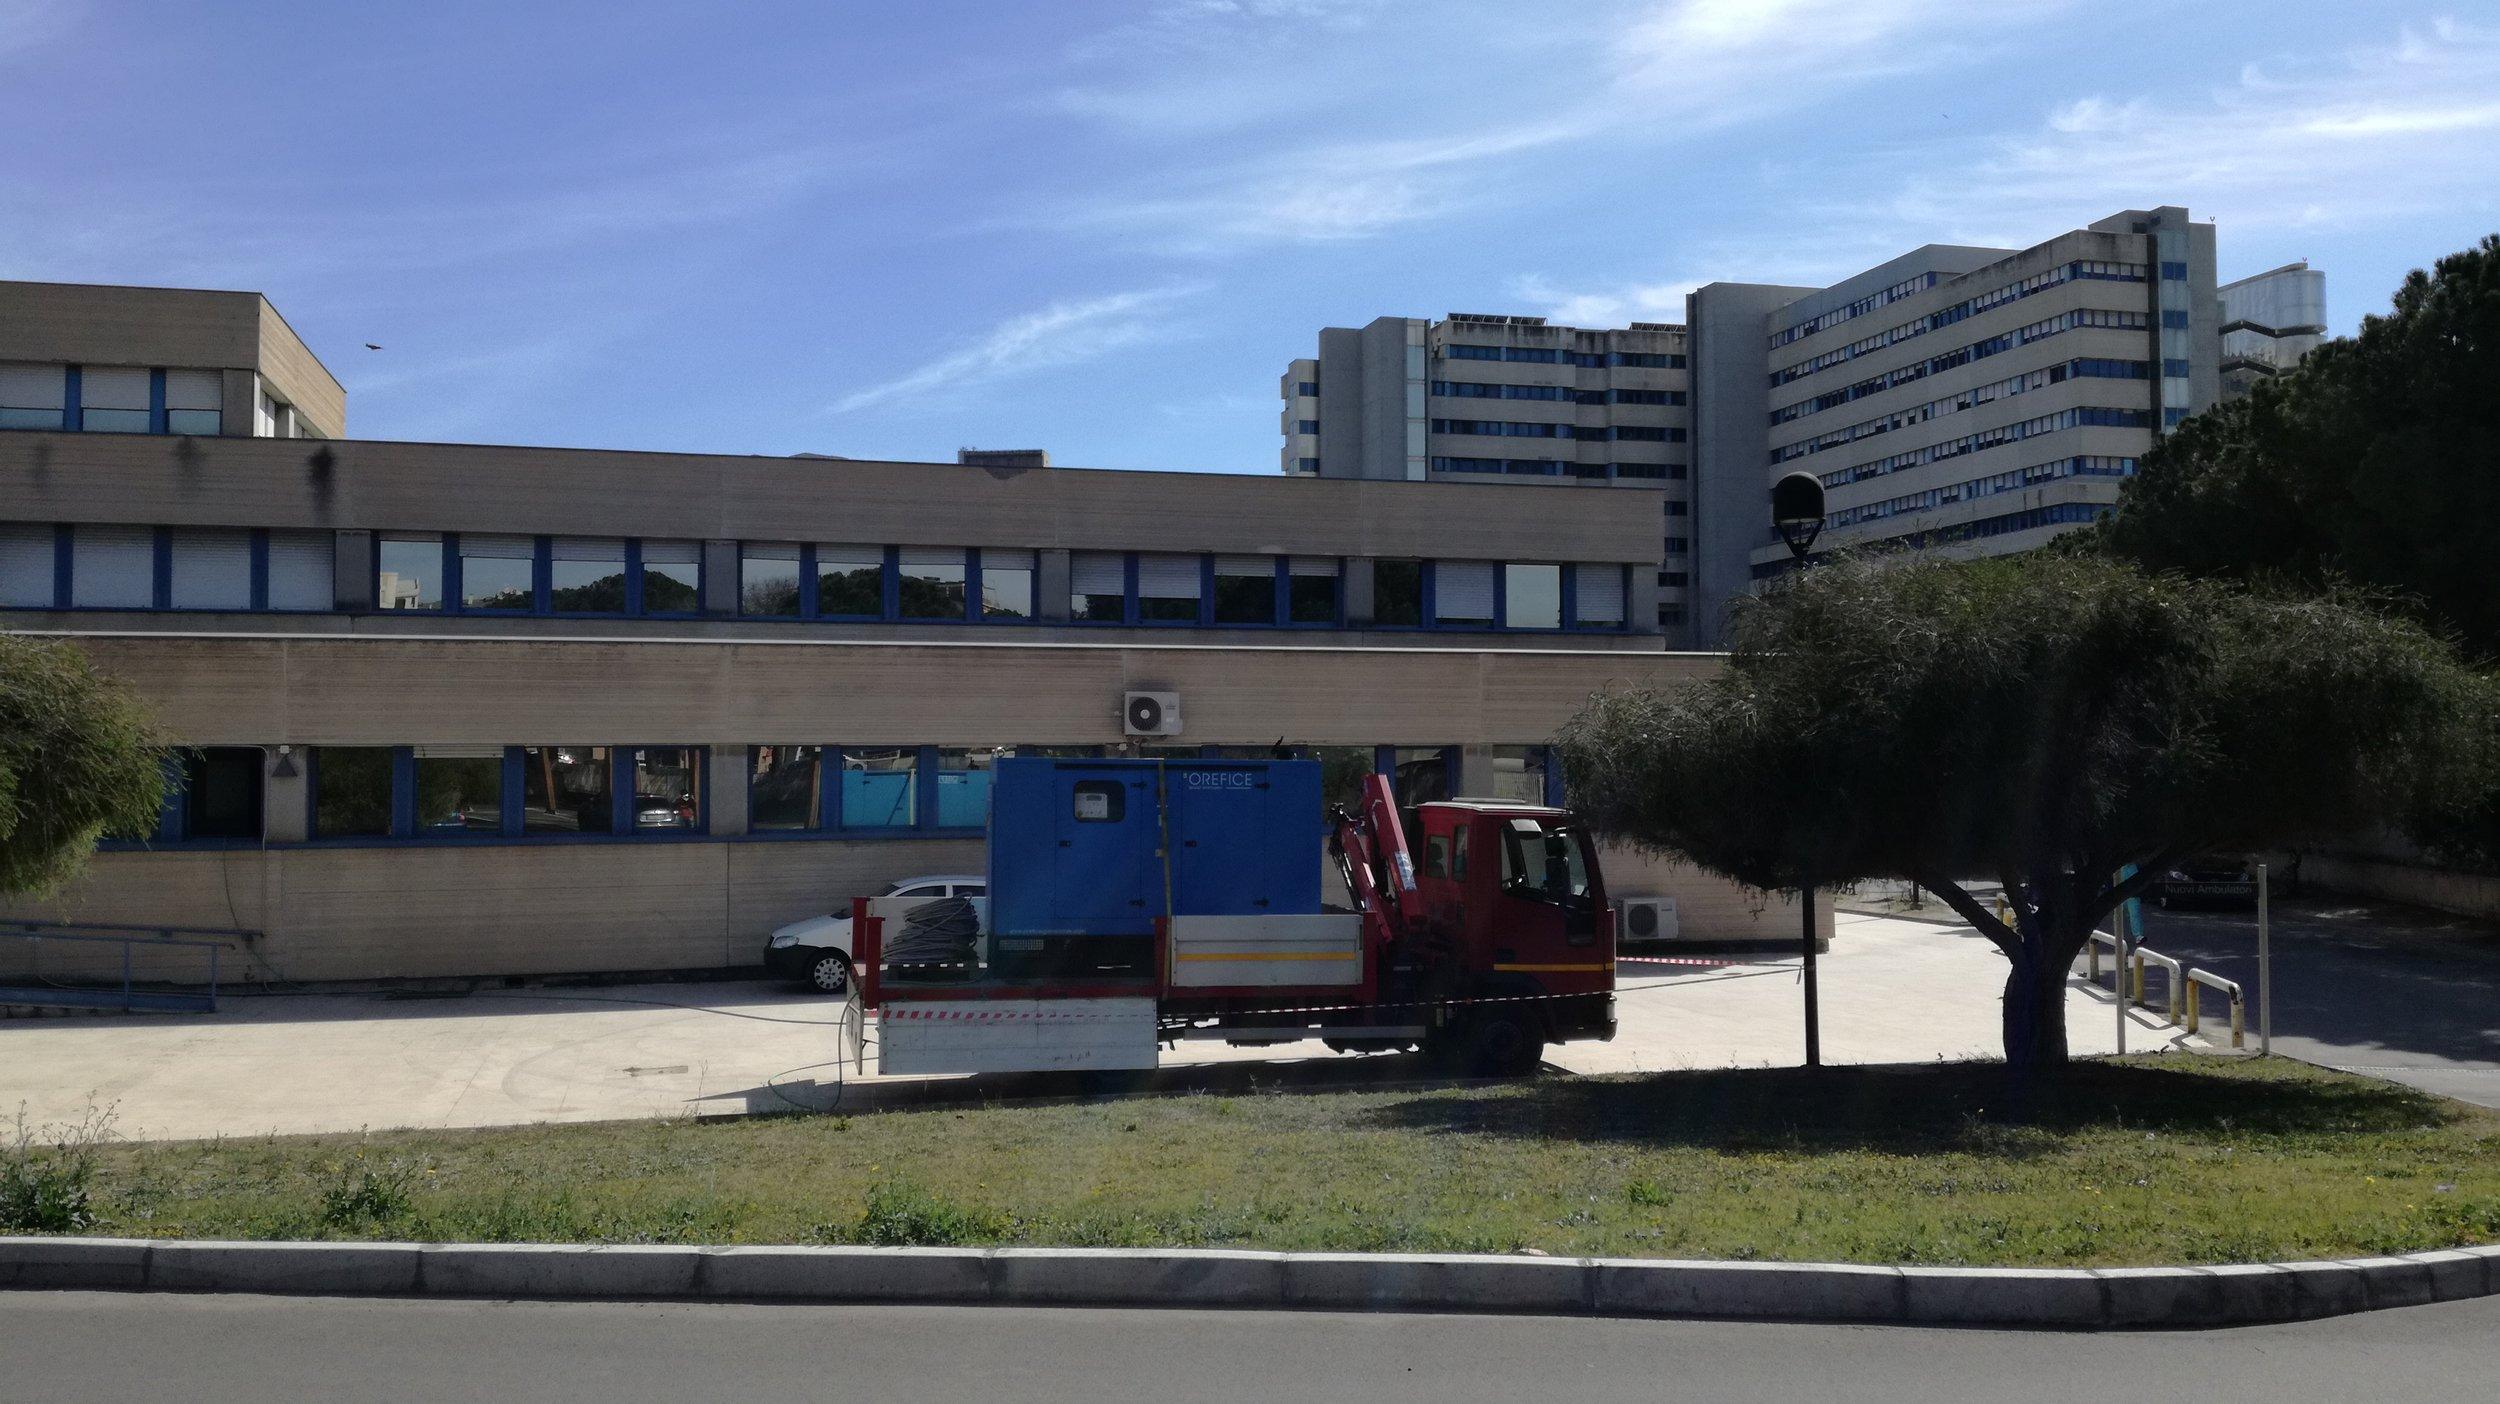 noleggio emergenza ospedale tj120 120kva.jpg